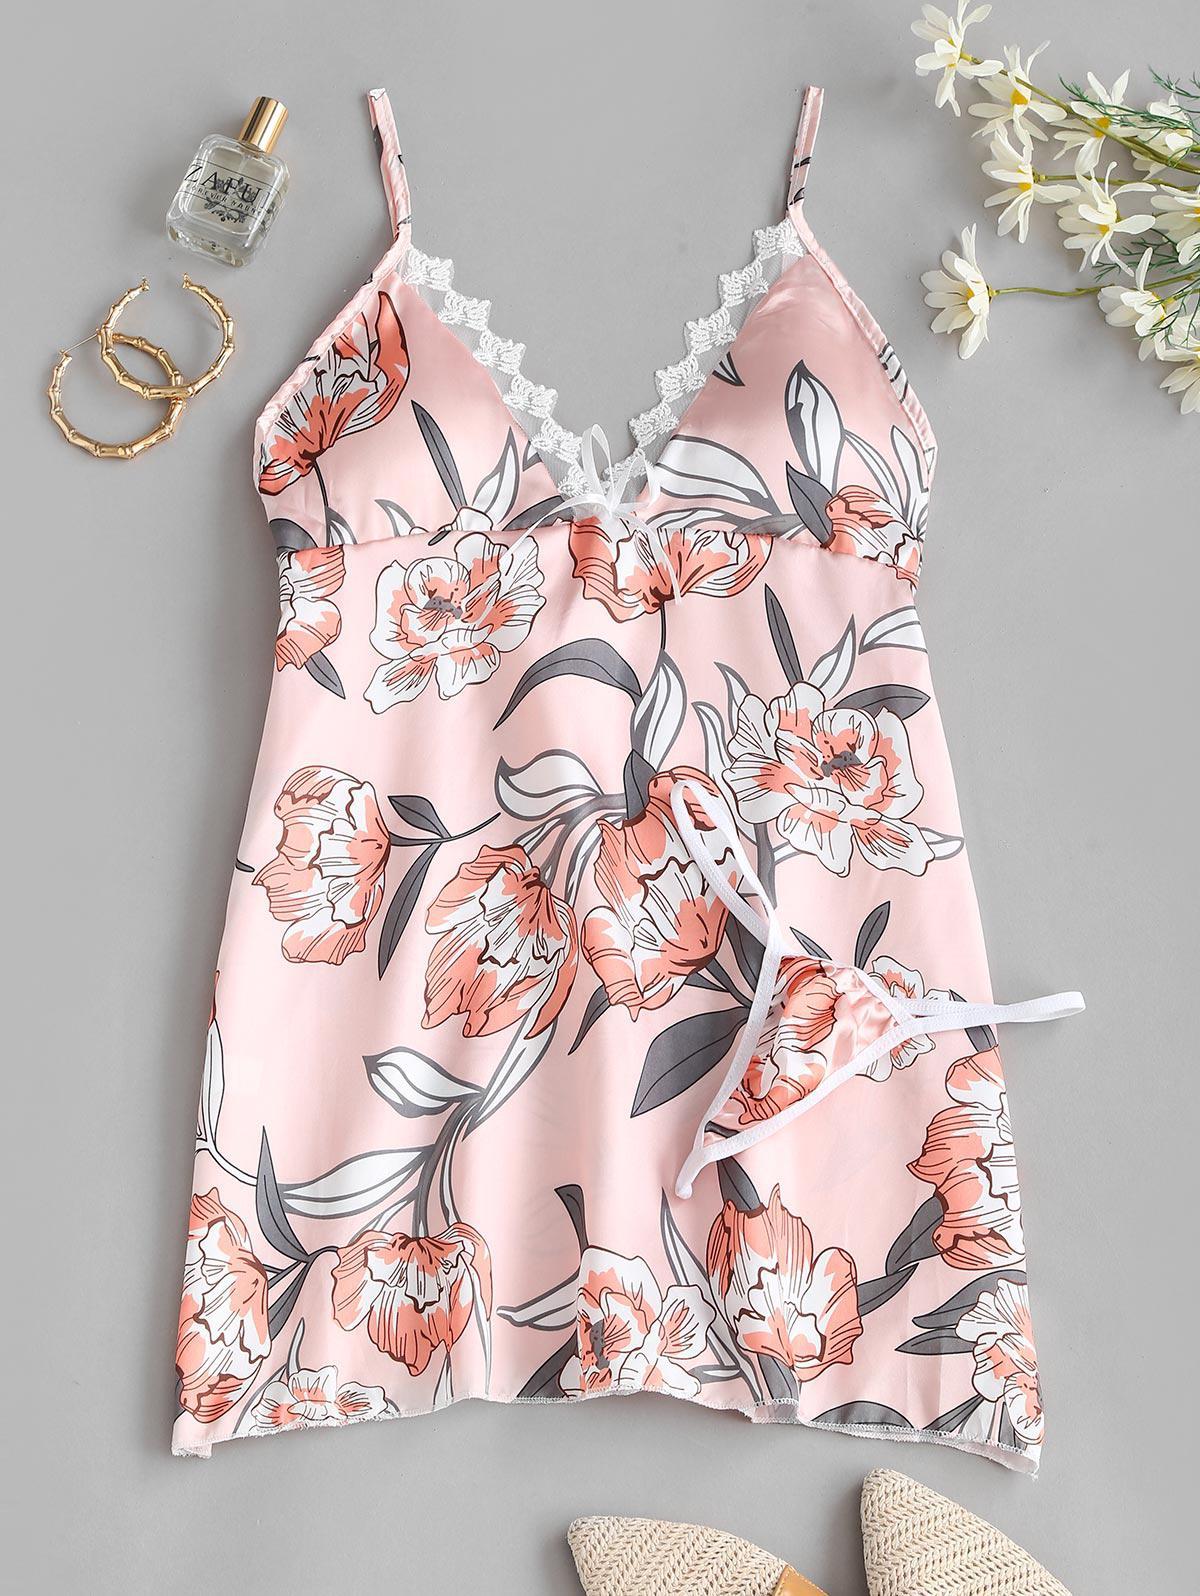 Mesh Trim Floral Satin Sleep Dress